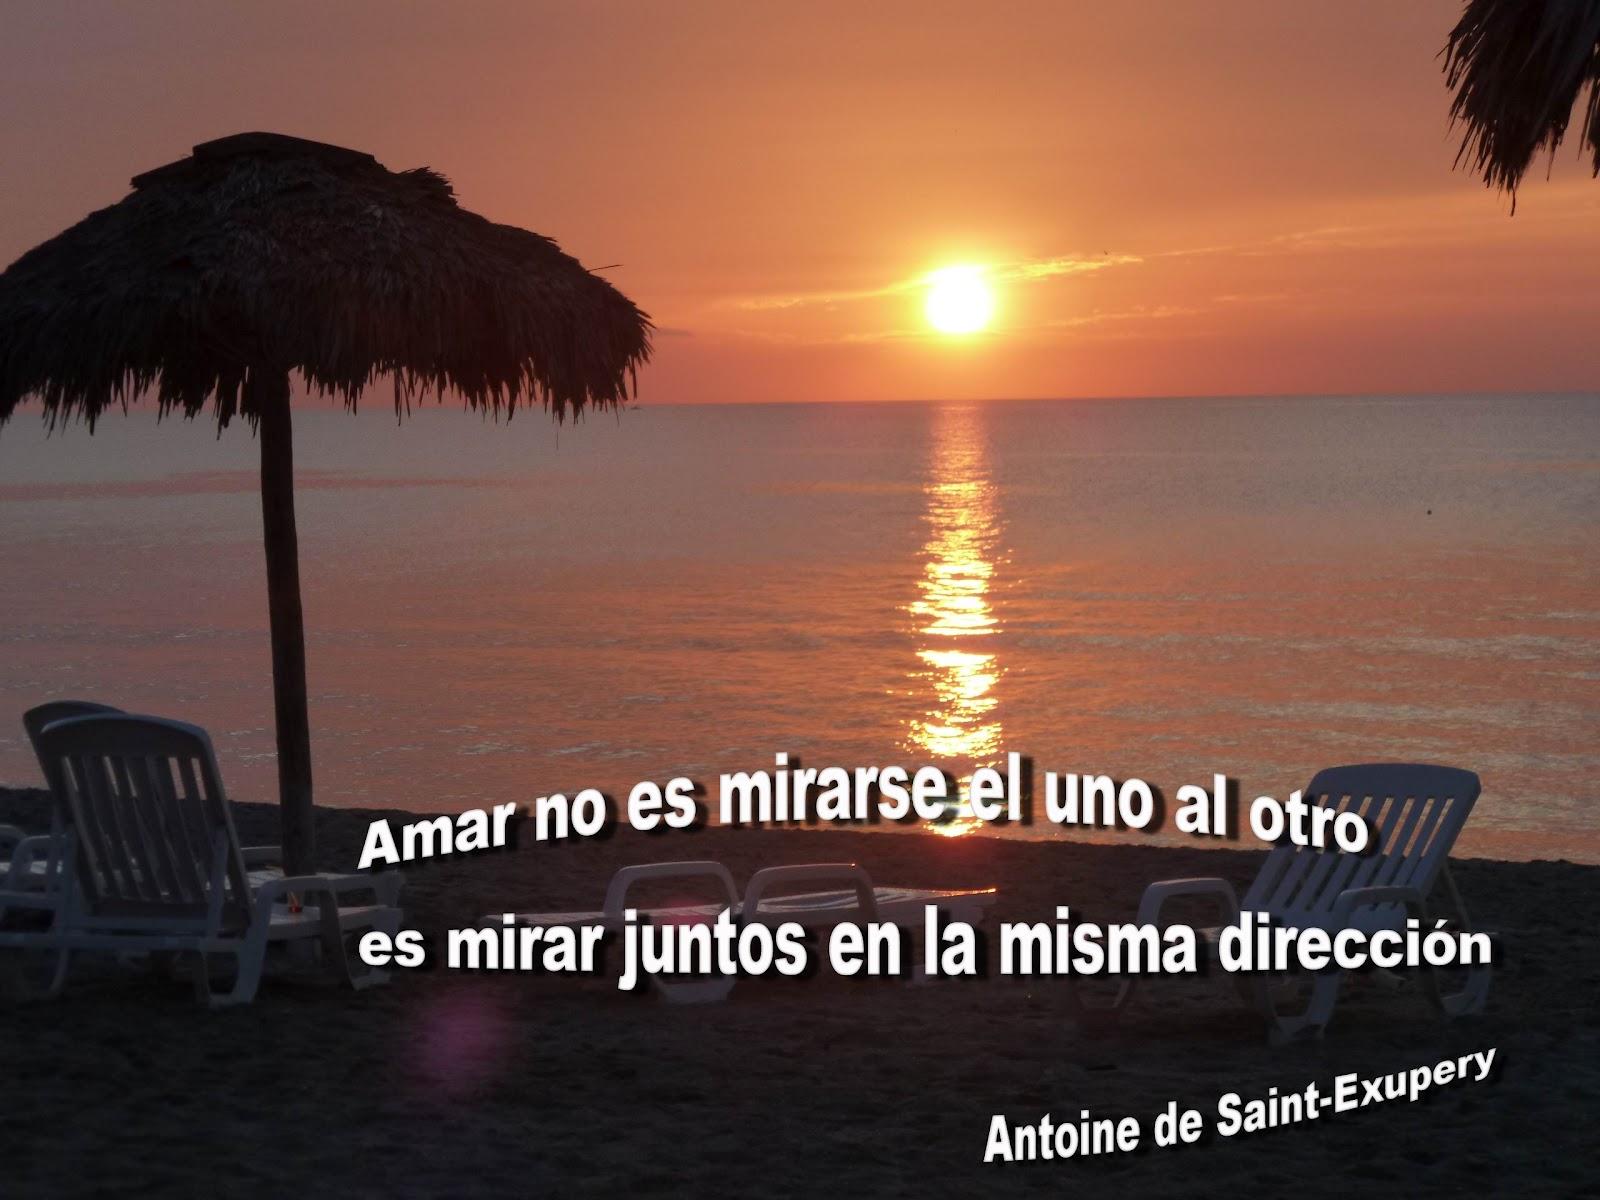 http://3.bp.blogspot.com/-CgAdl4bsPqg/T6Hy0in3elI/AAAAAAAAAC8/rjQhU1cnFRQ/s1600/frases+bonitas+para+facebook15pg.jpg